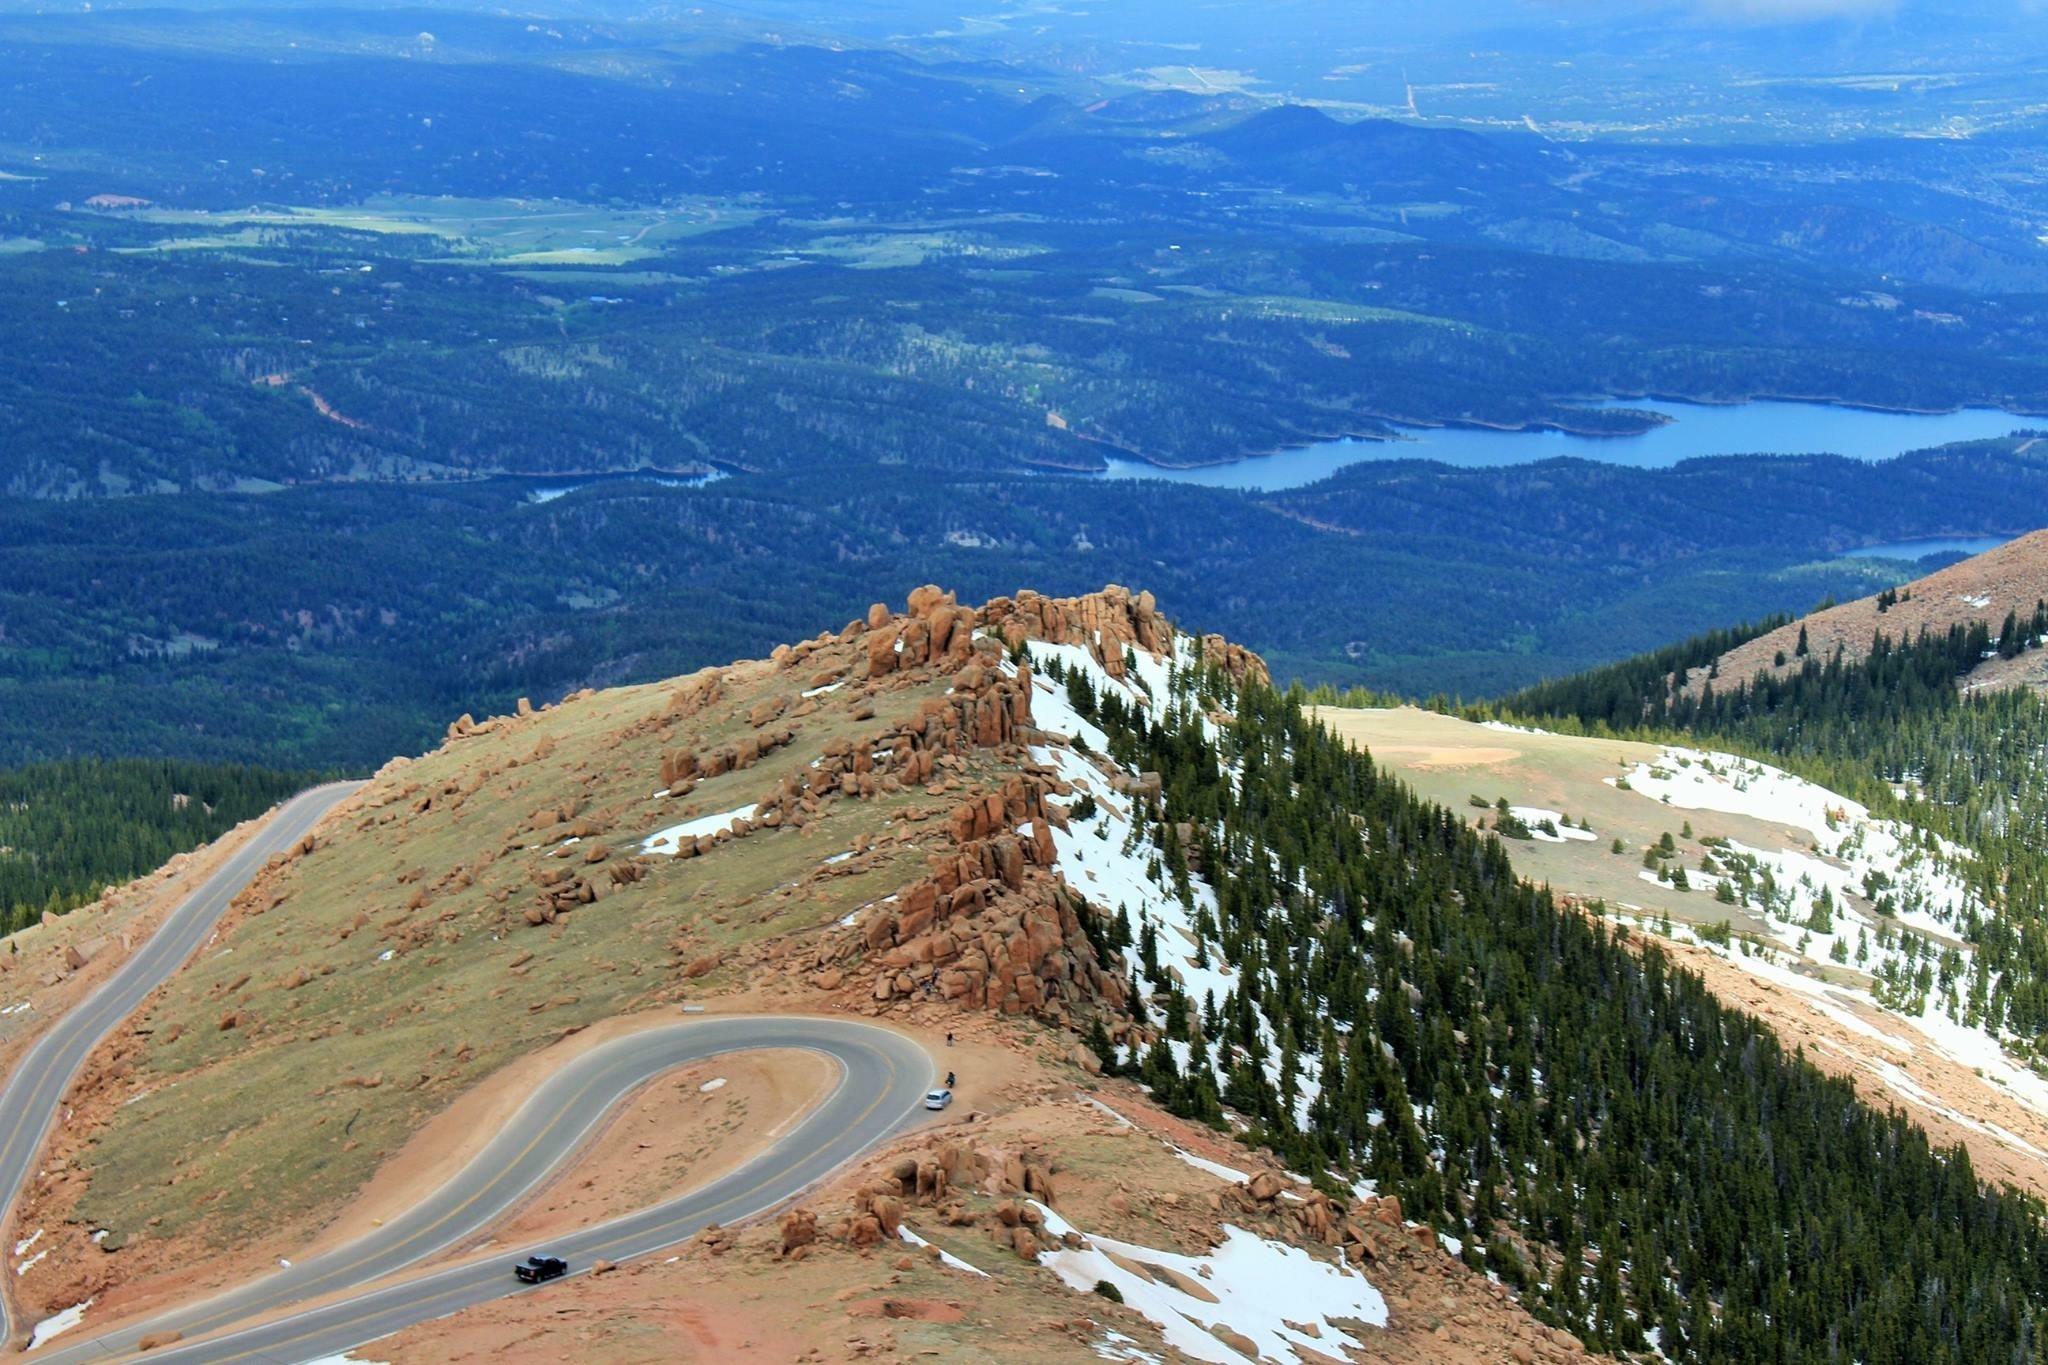 Pikes Peak by Kimberly Nicole Thornton